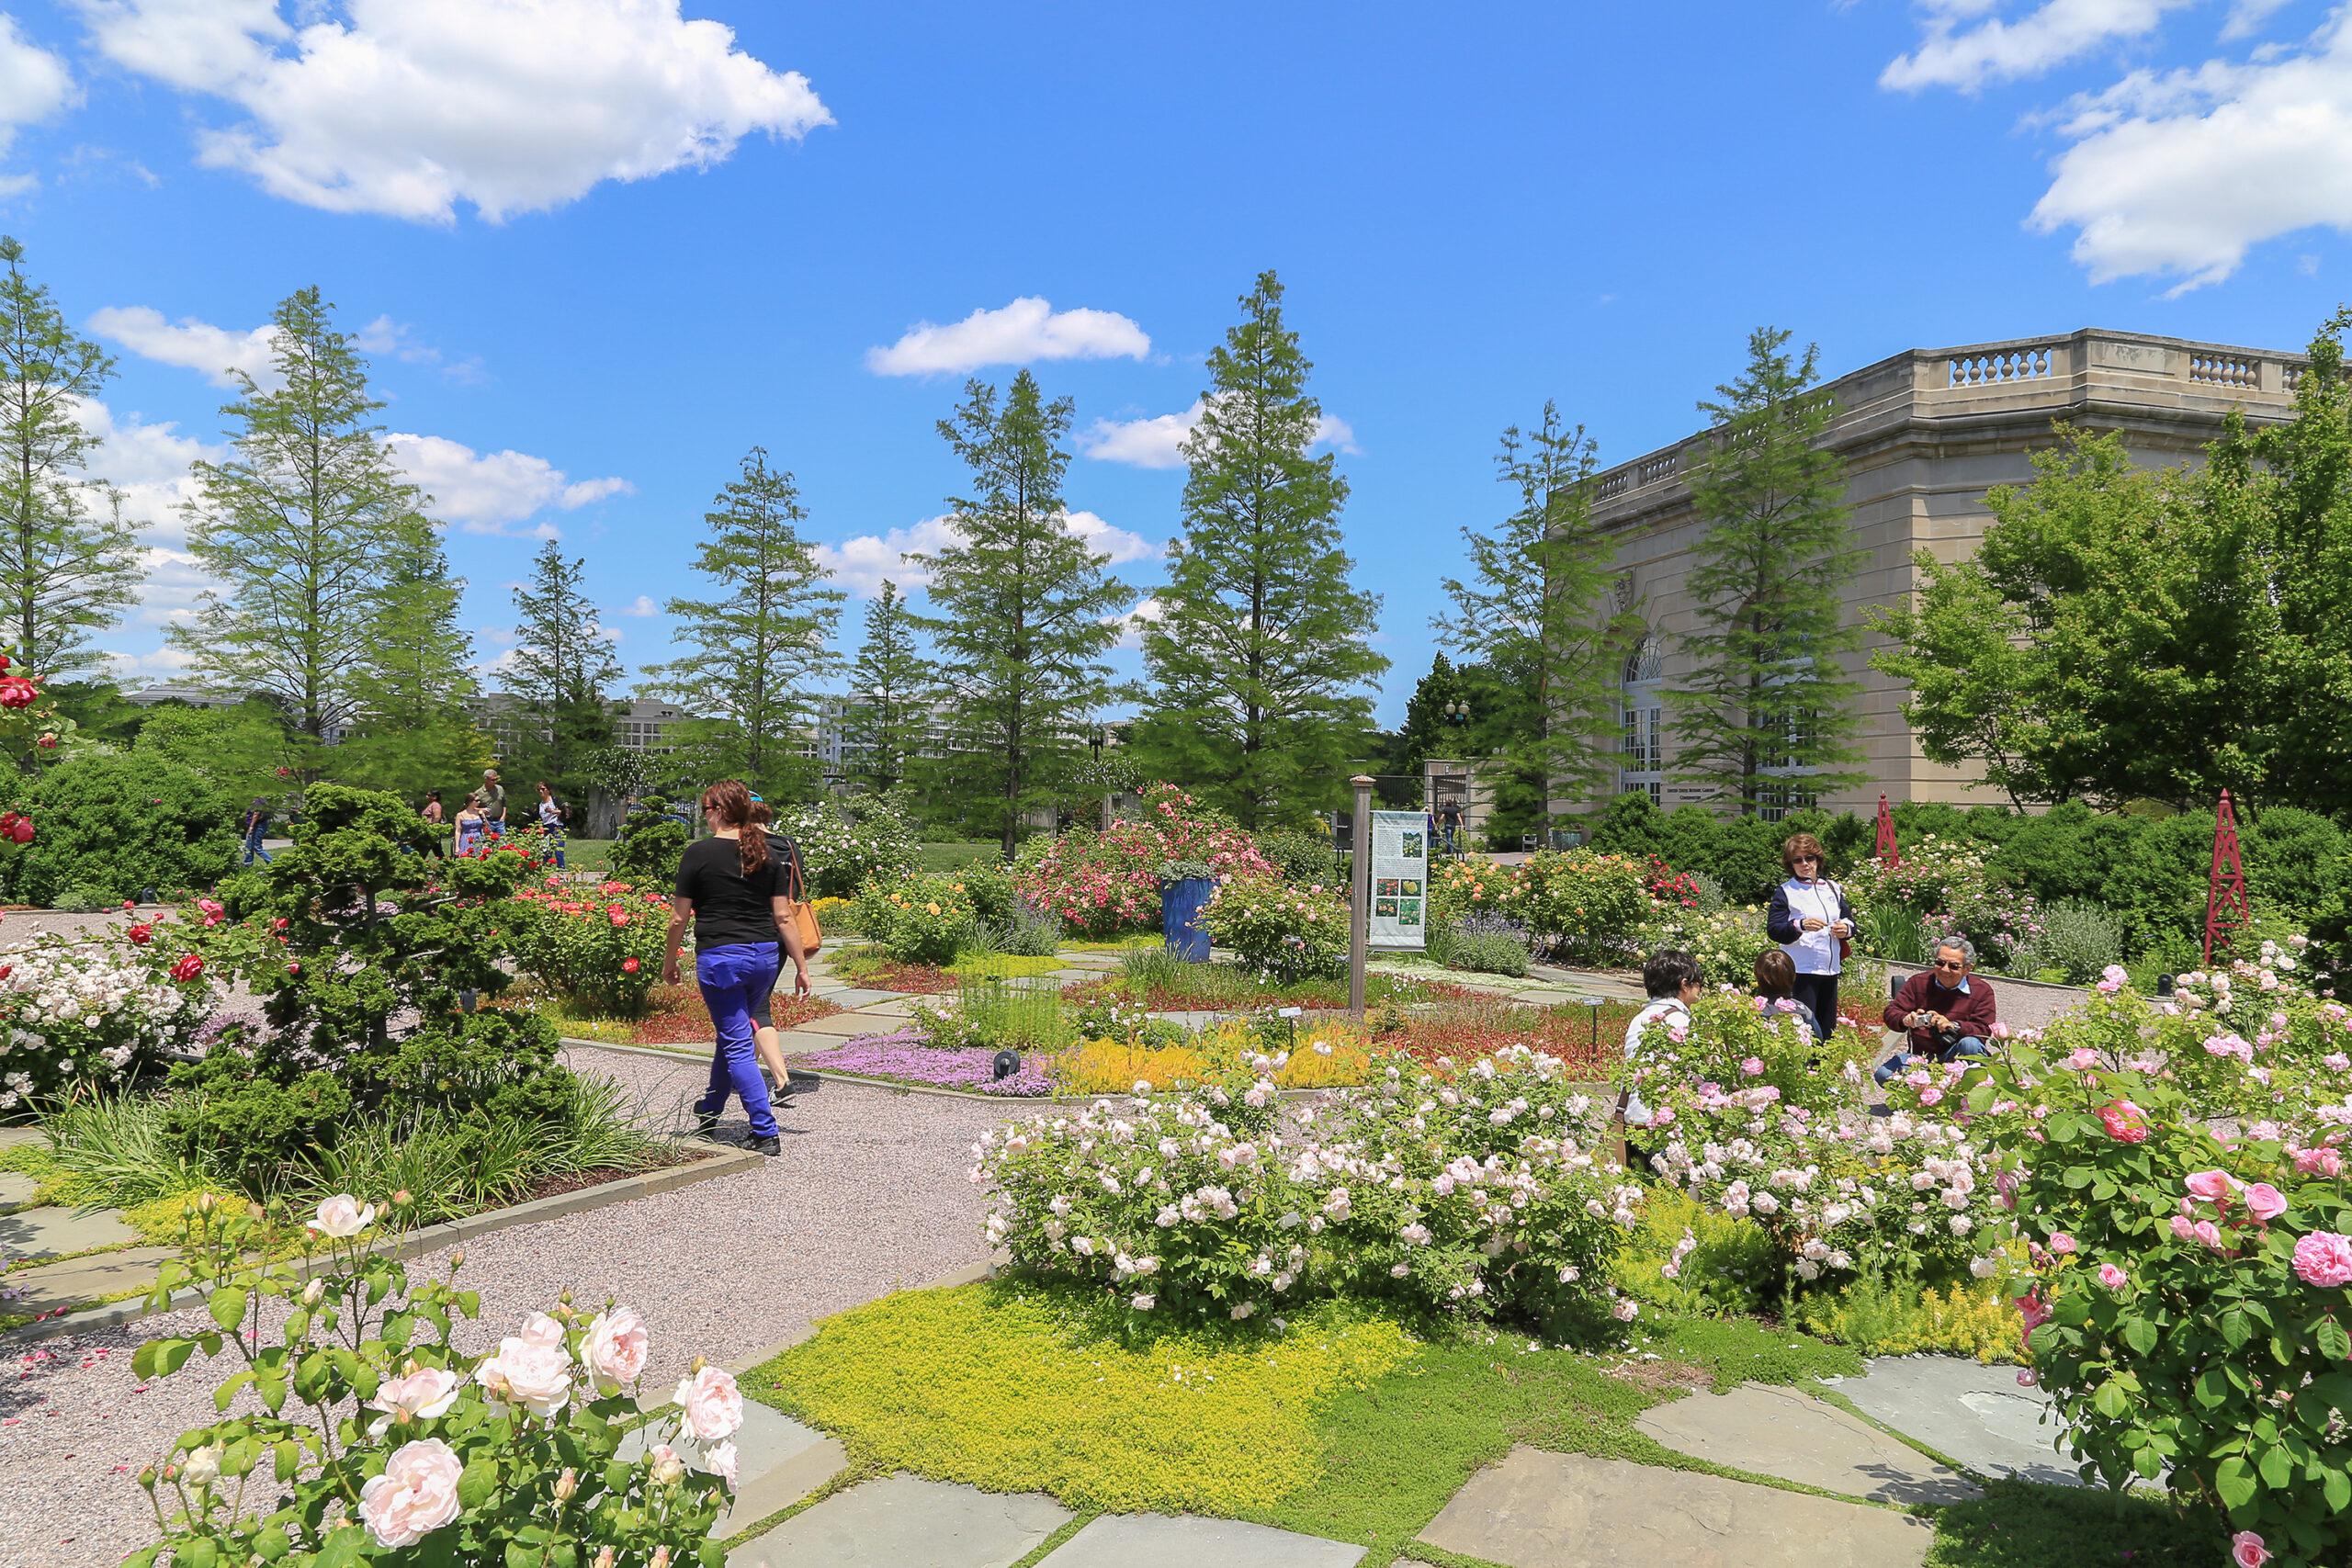 The National US Botanical Gardens in Washington, DC, USA.